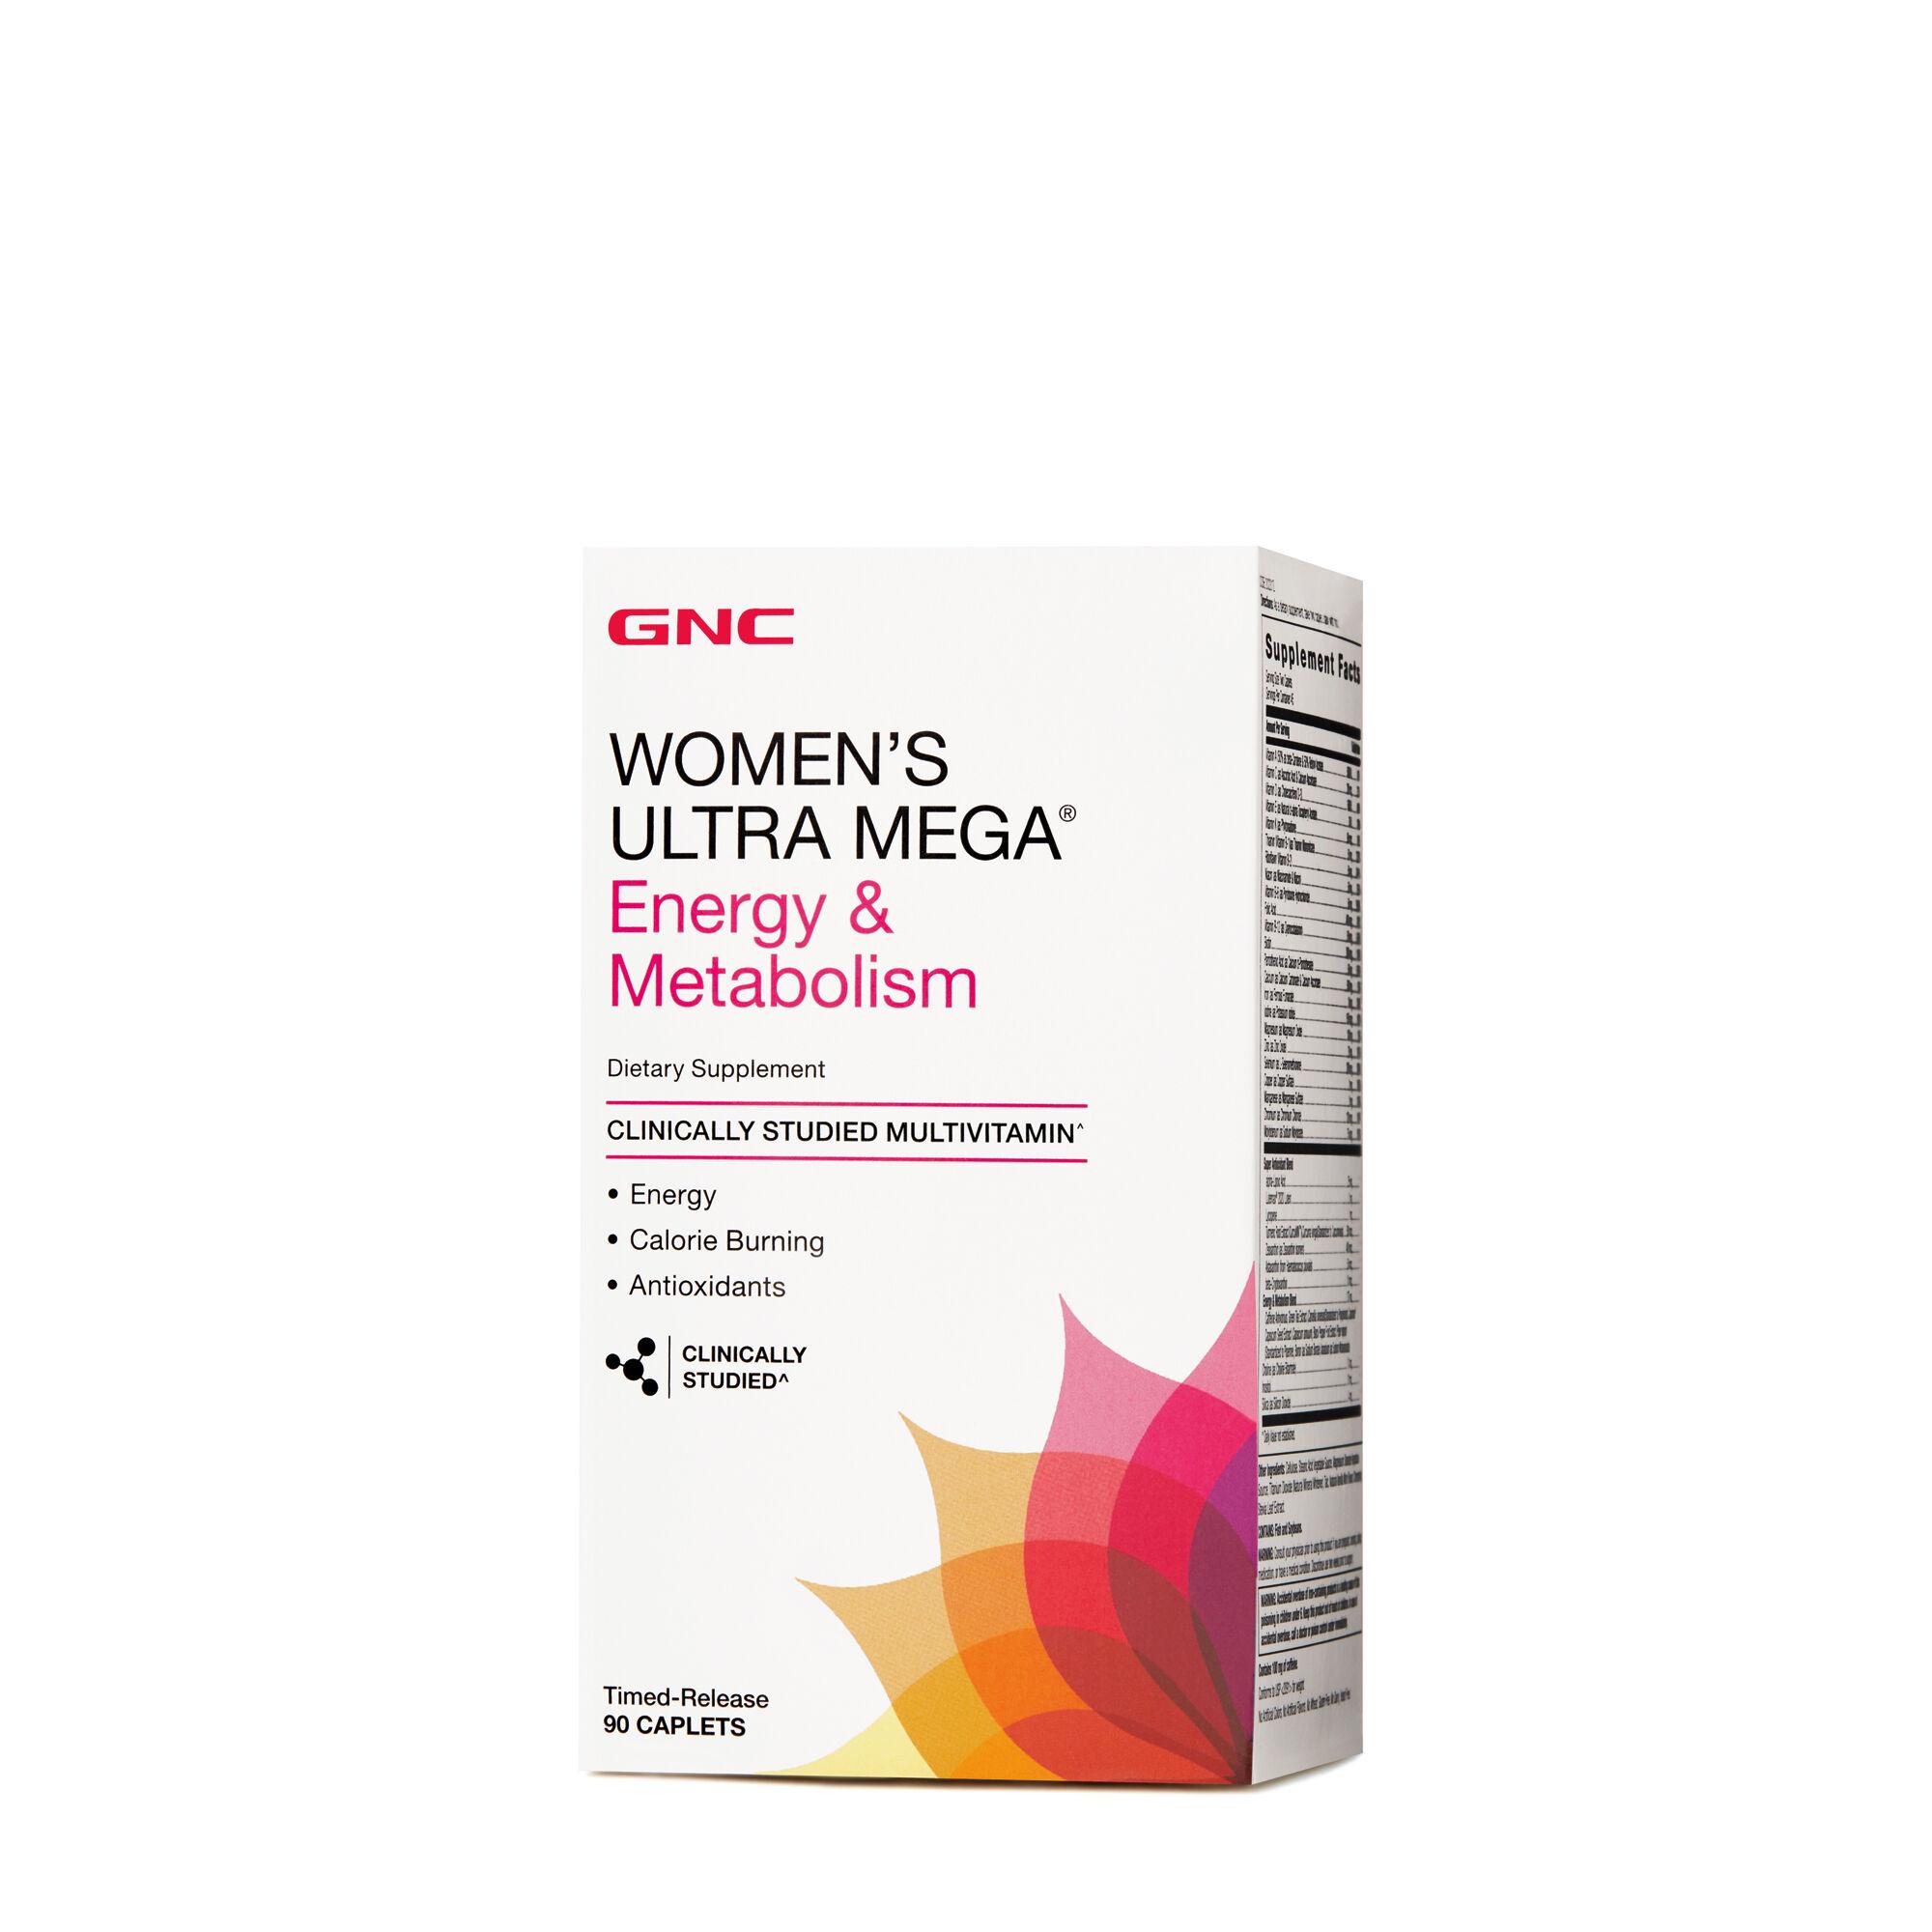 GNC Women's Ultra Mega® Energy & Metabolism